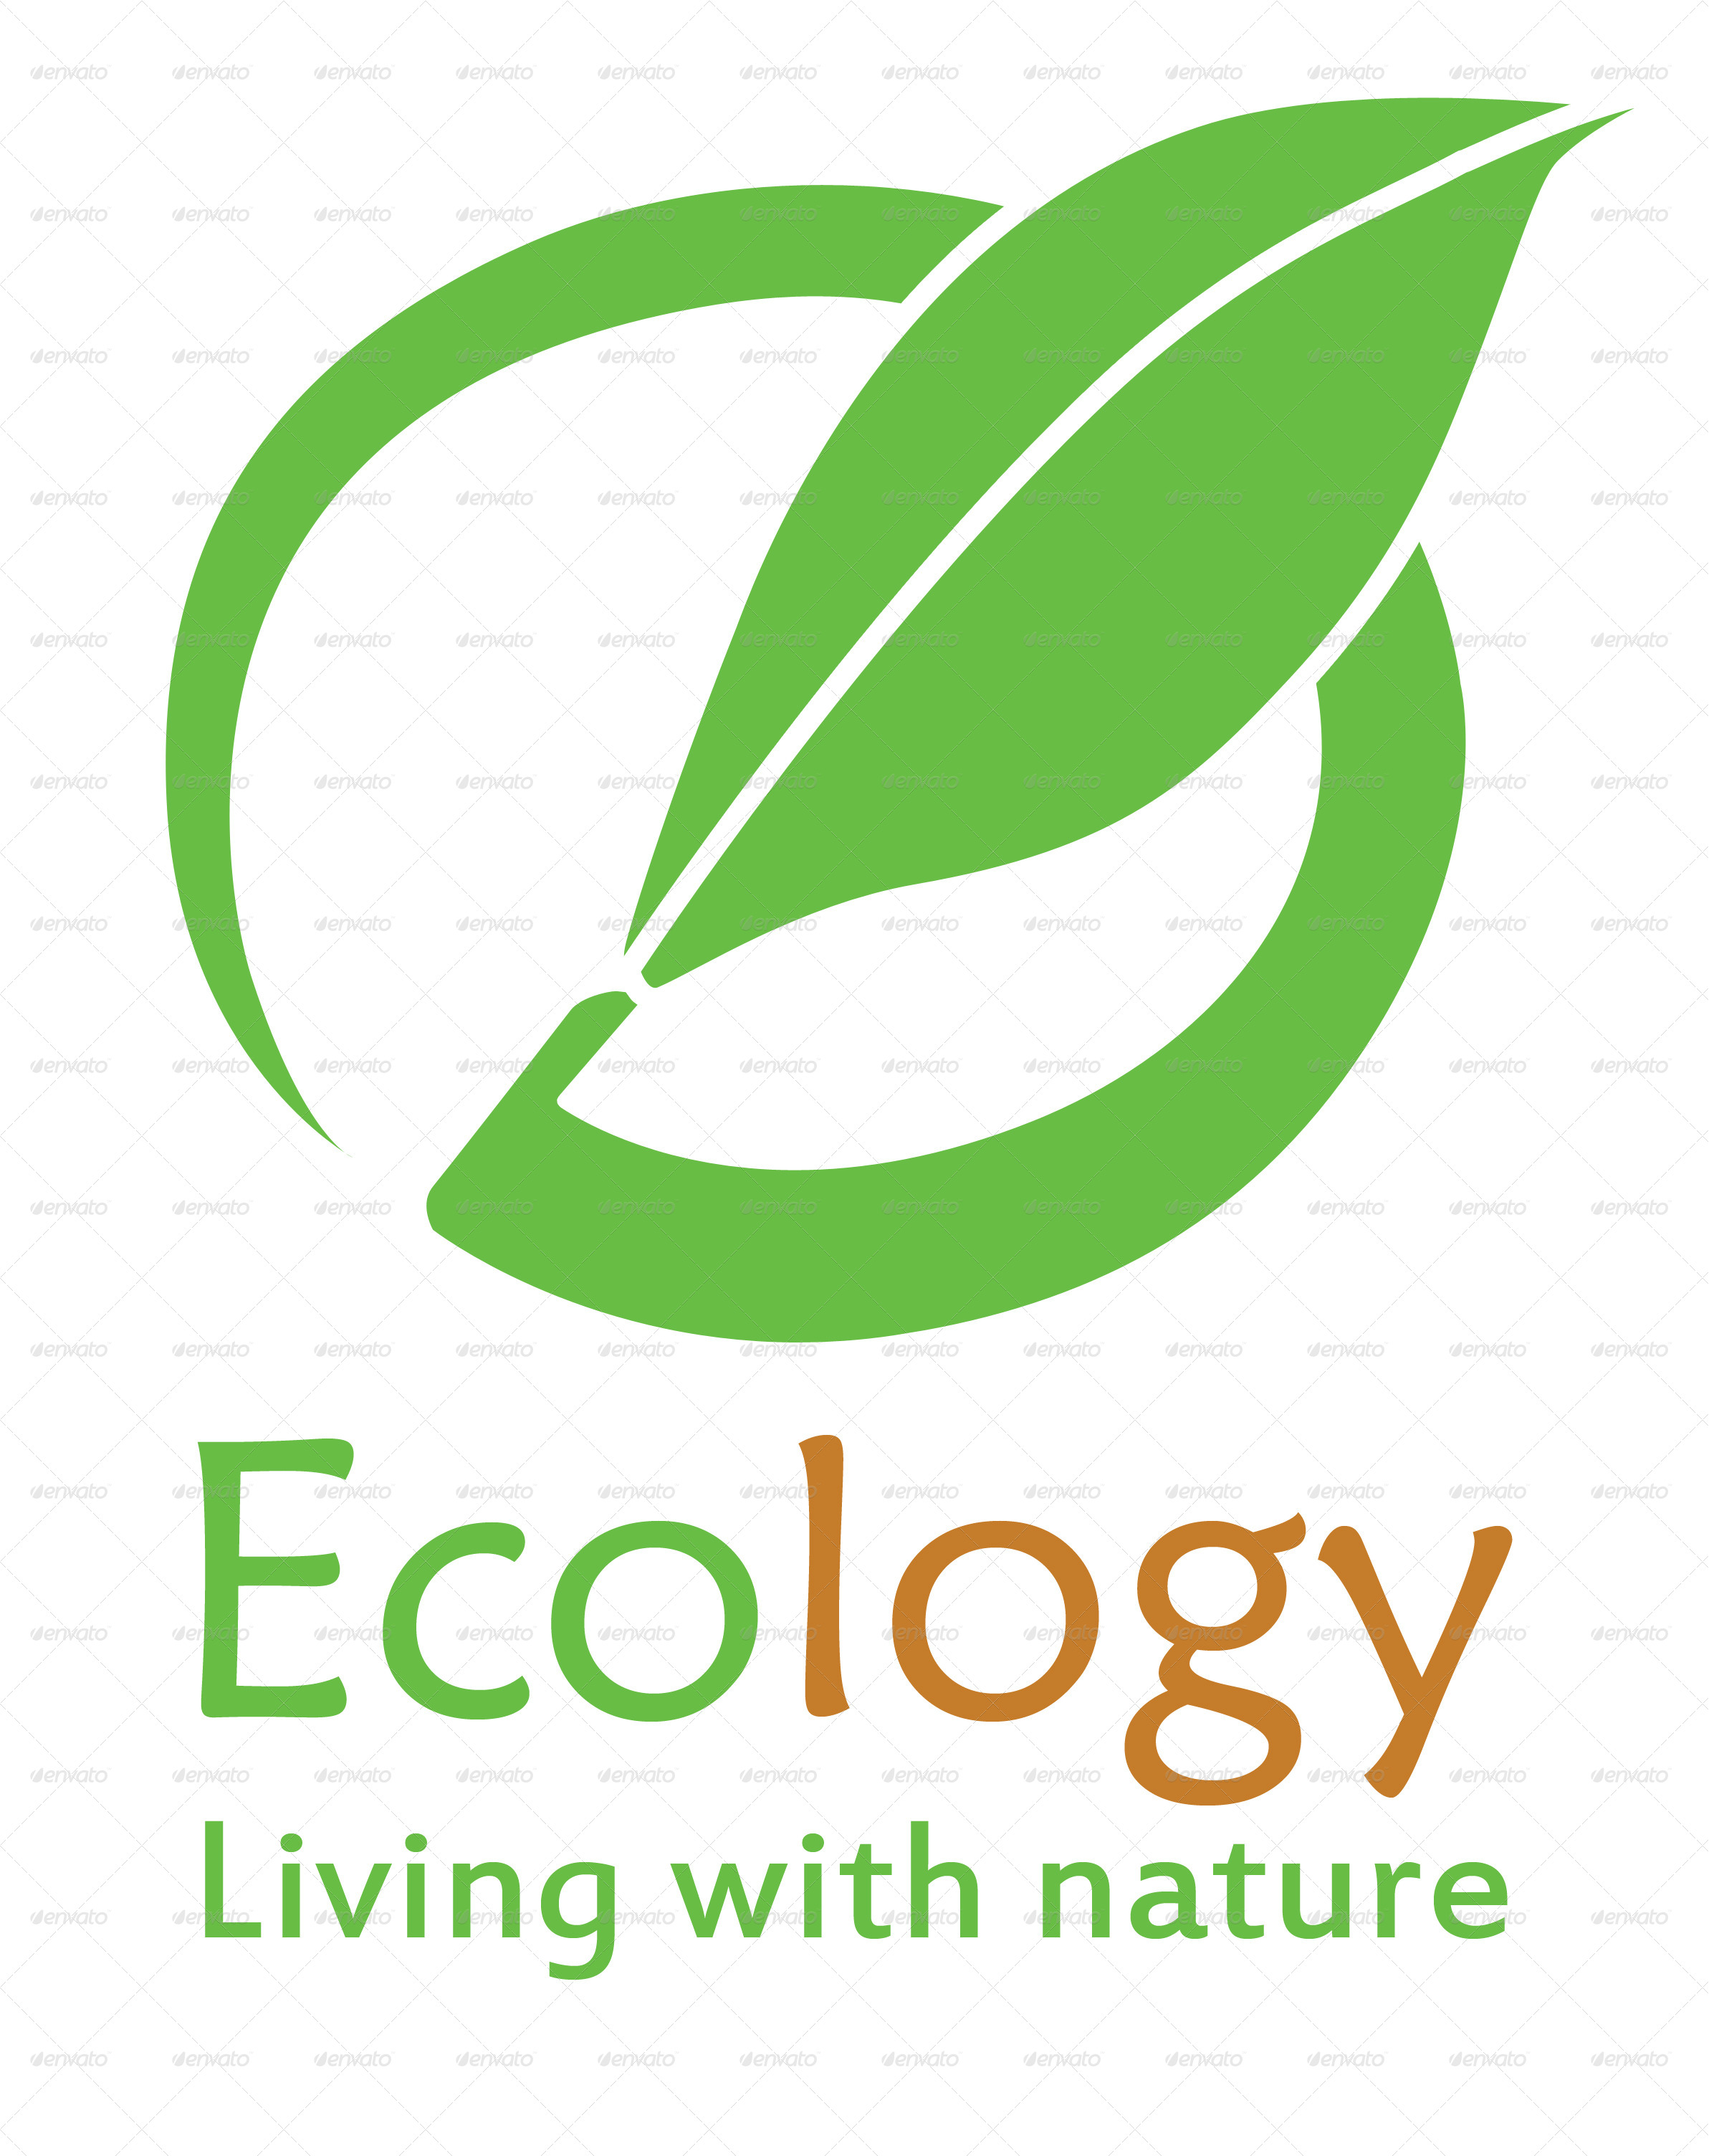 Ecology logo by pixelariskie graphicriver for Envato graphicriver